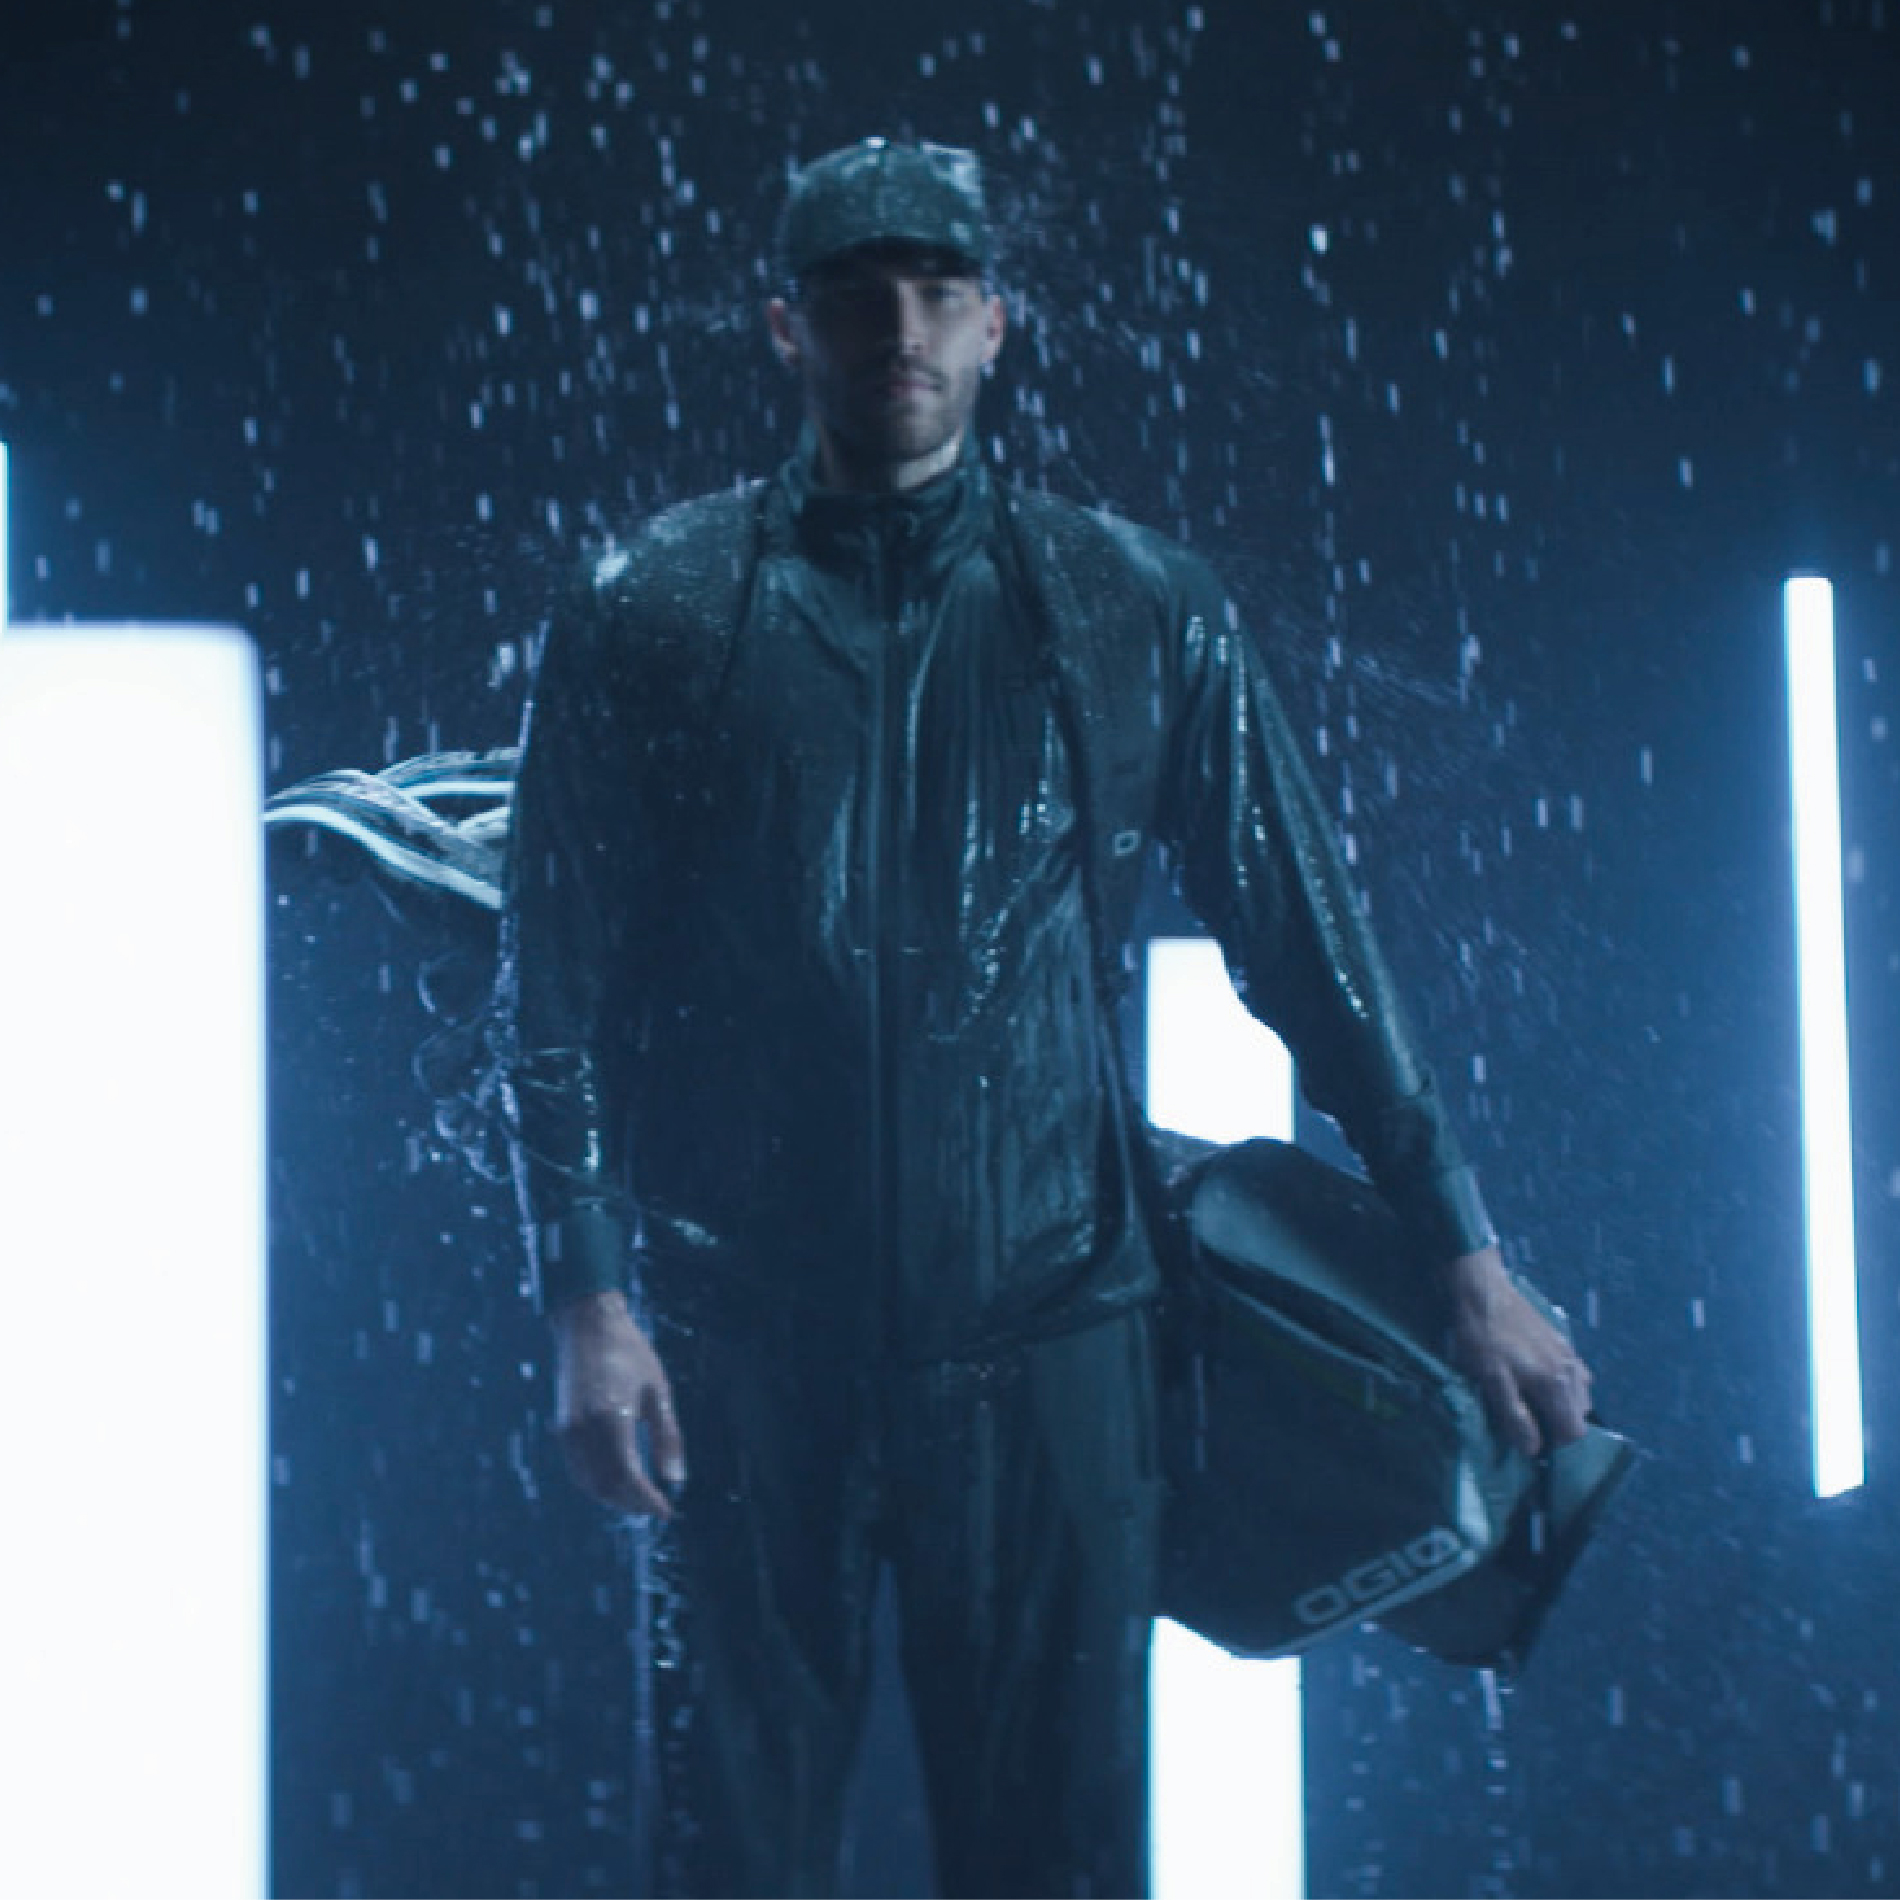 ogio-outerwear-2019-all-elements-rain-jacket-lifestyle-1